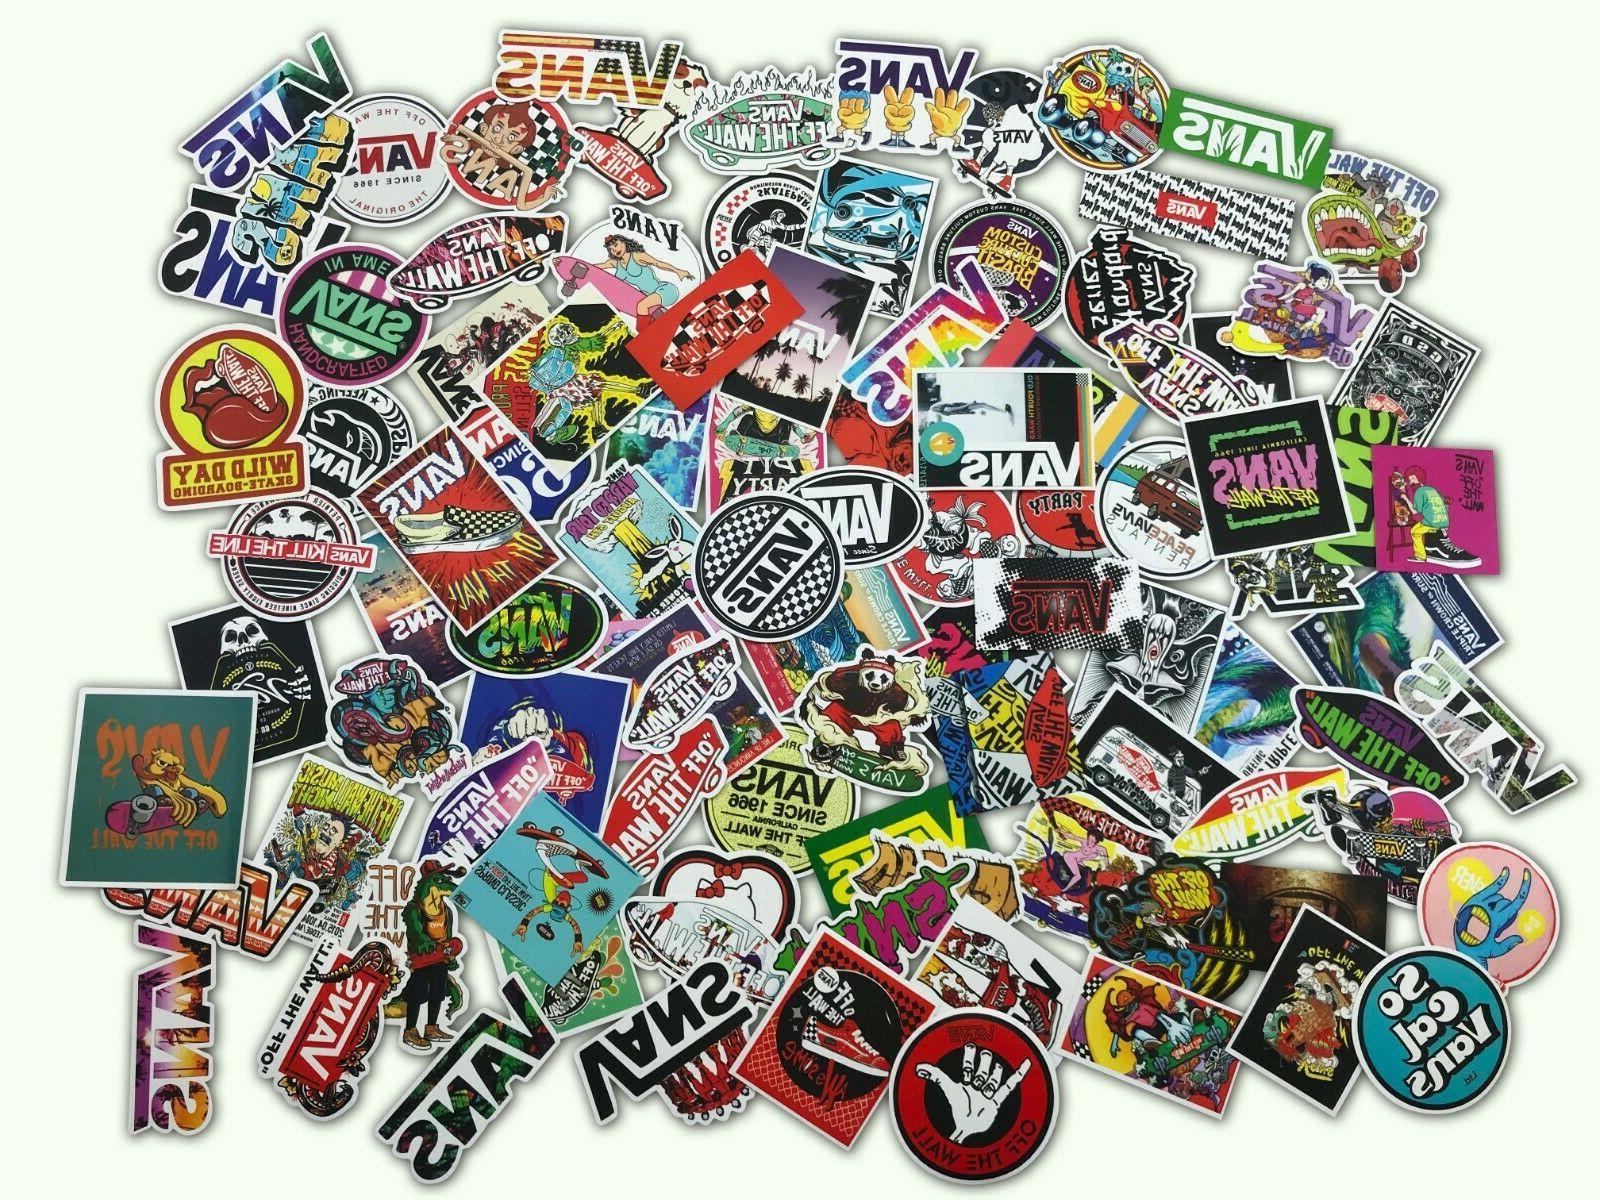 100 VANS OFF Sticker Laptop Lot